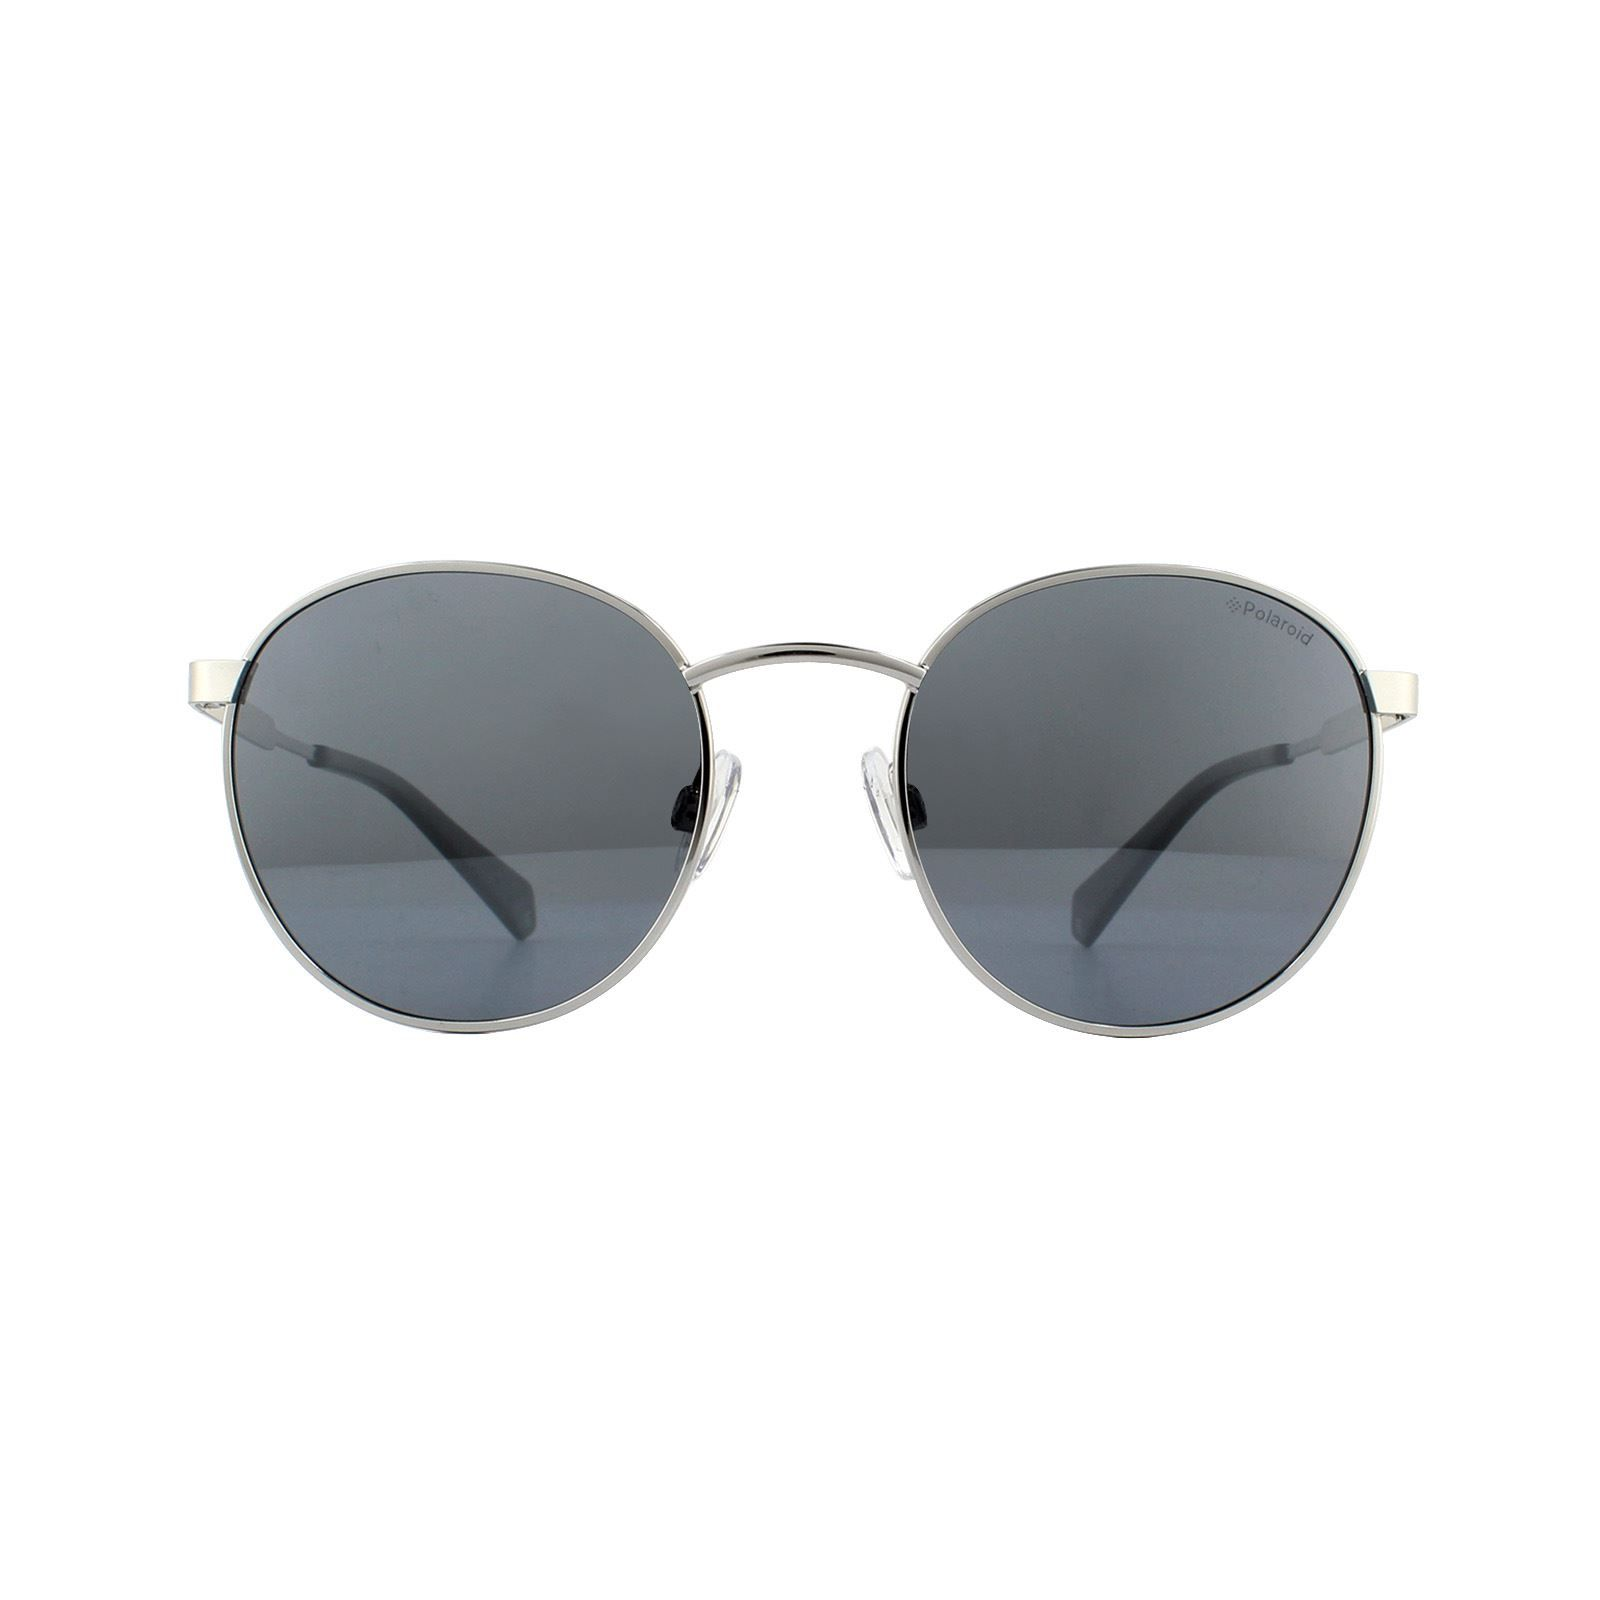 Polaroid Sunglasses PLD 2053/S 010 EX Palladium Grey Silver Mirror Polarized